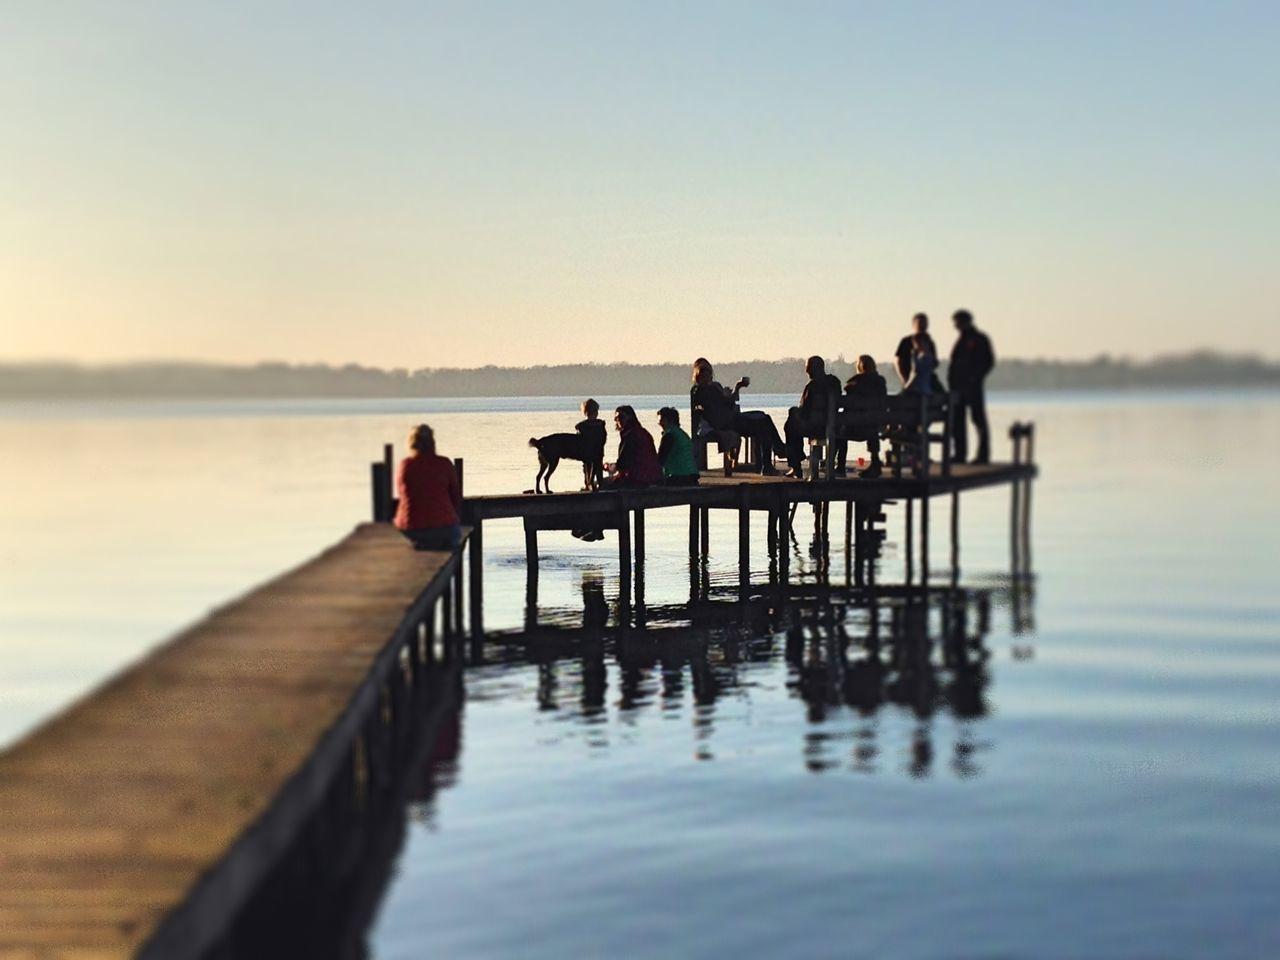 Tourists sitting on pier